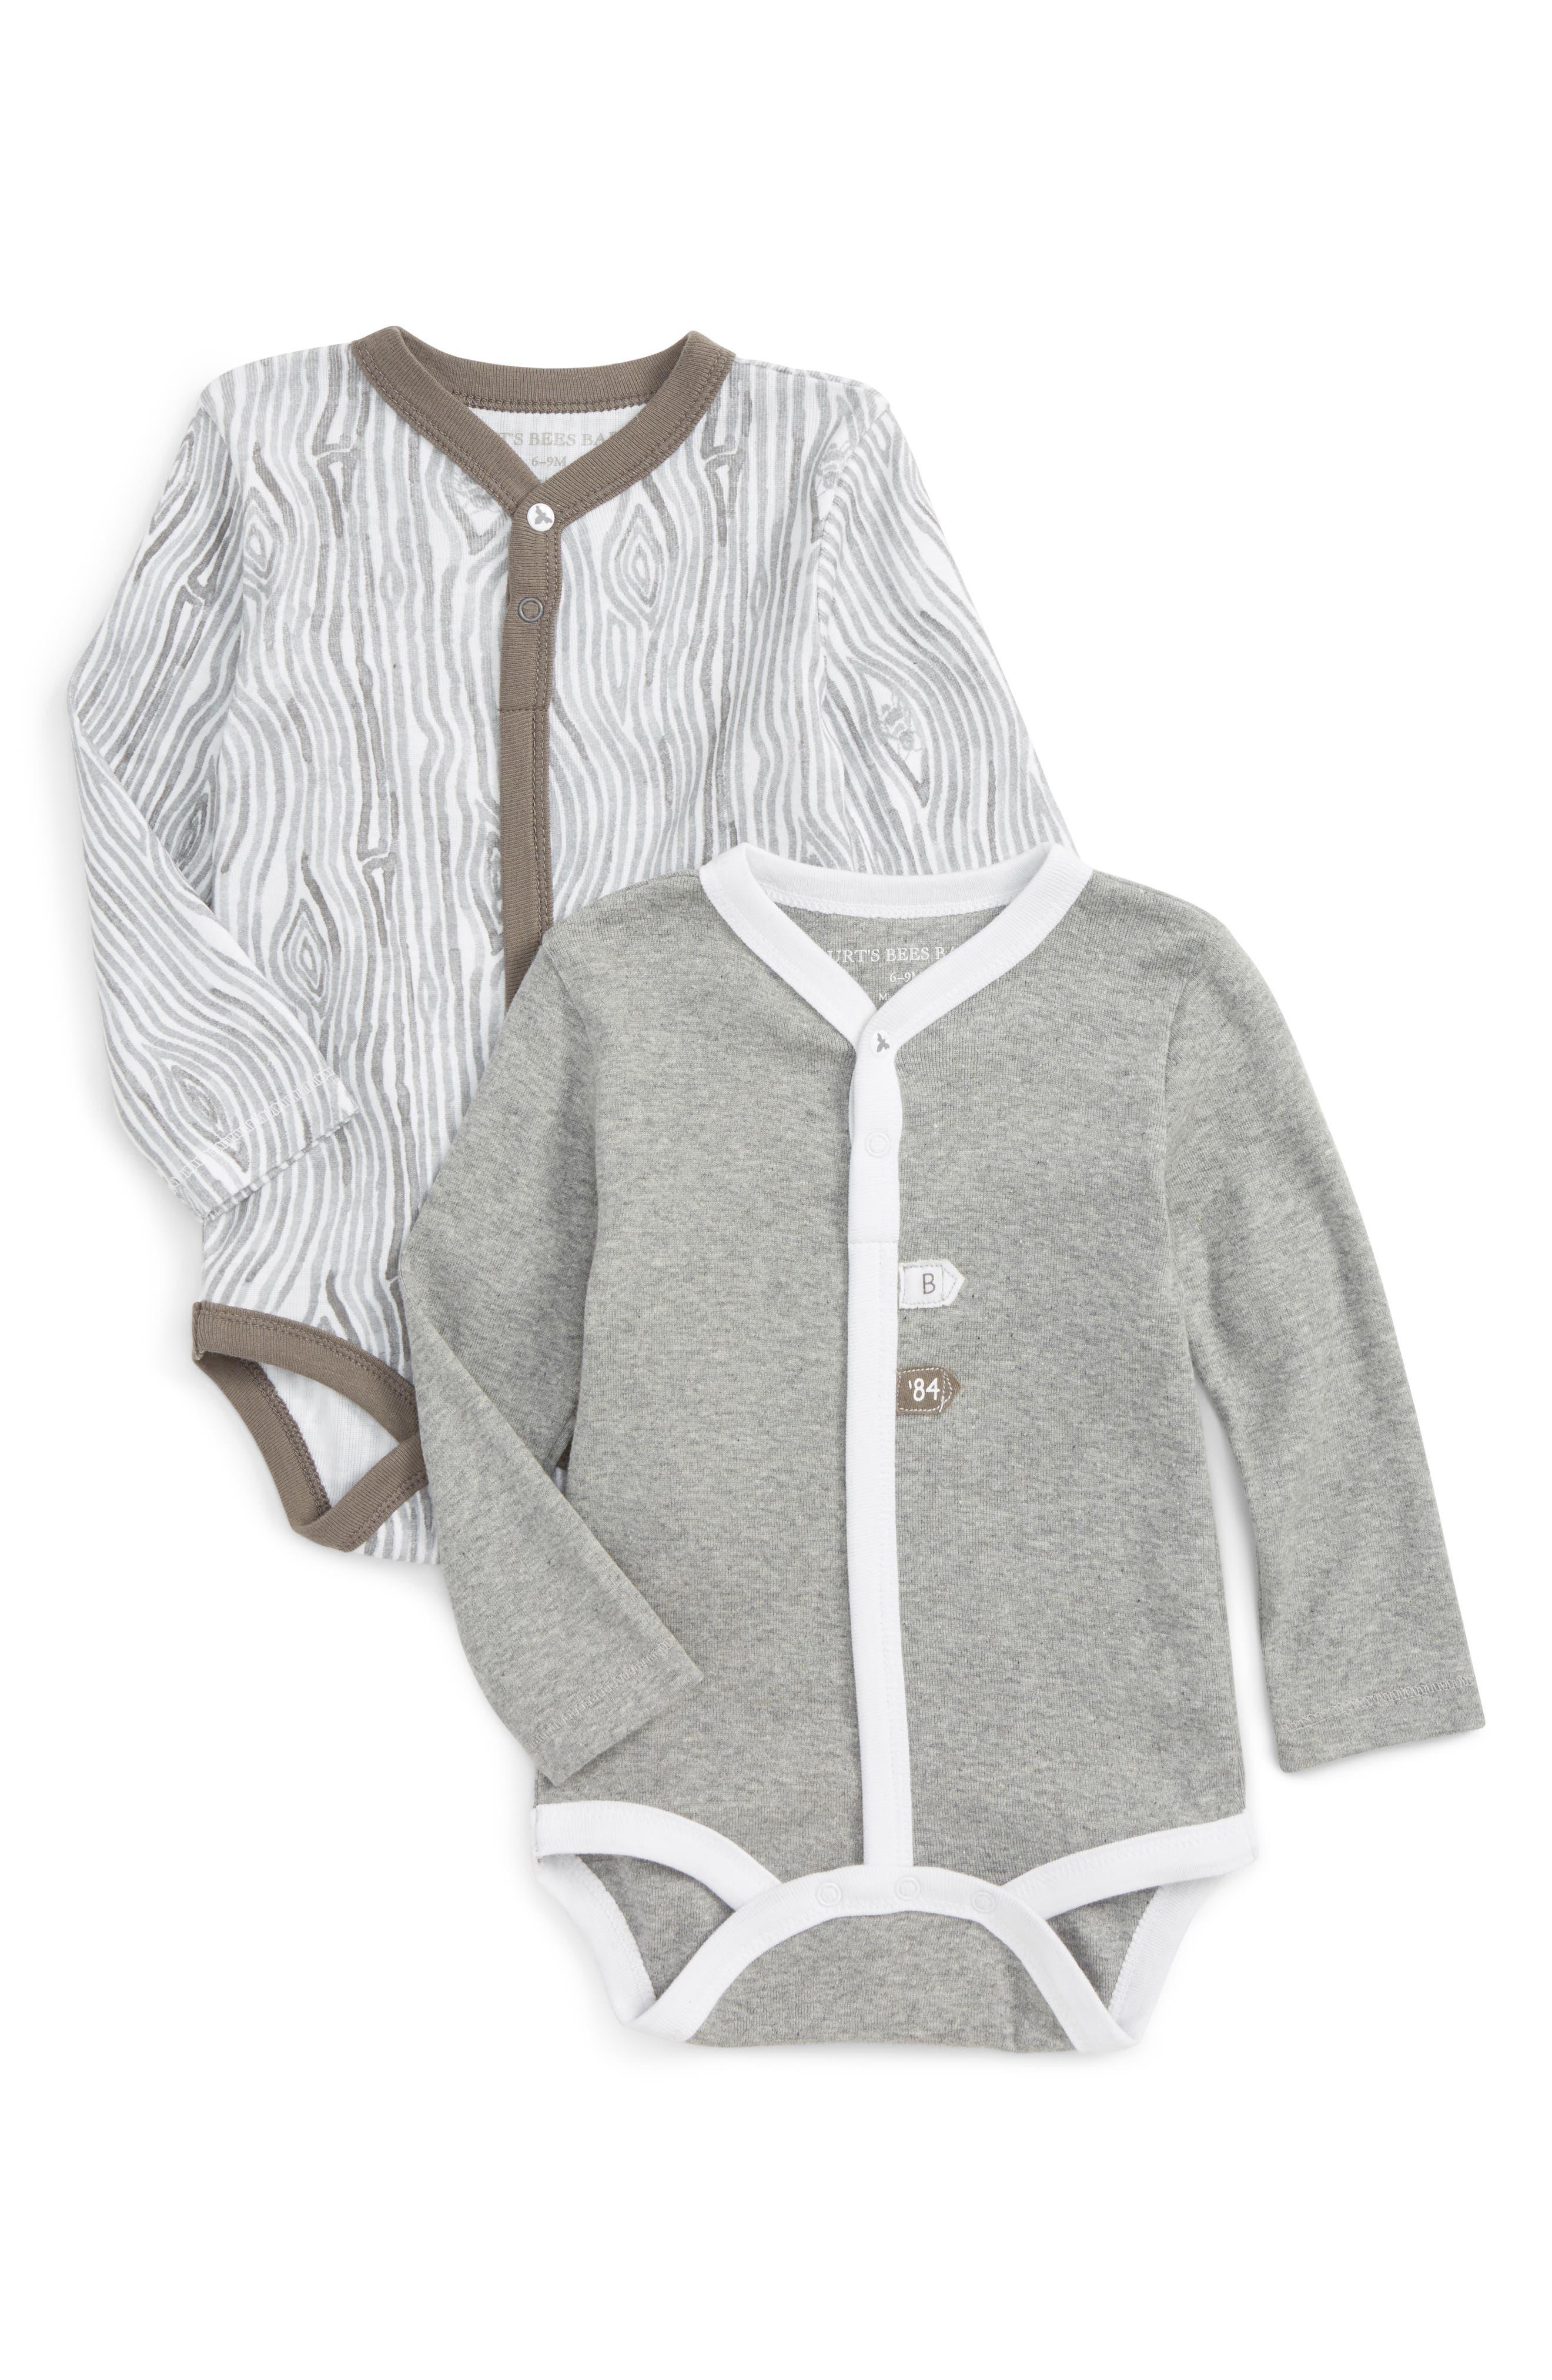 BURTS BEES BABY 2-Pack Print Organic Cotton Bodysuits